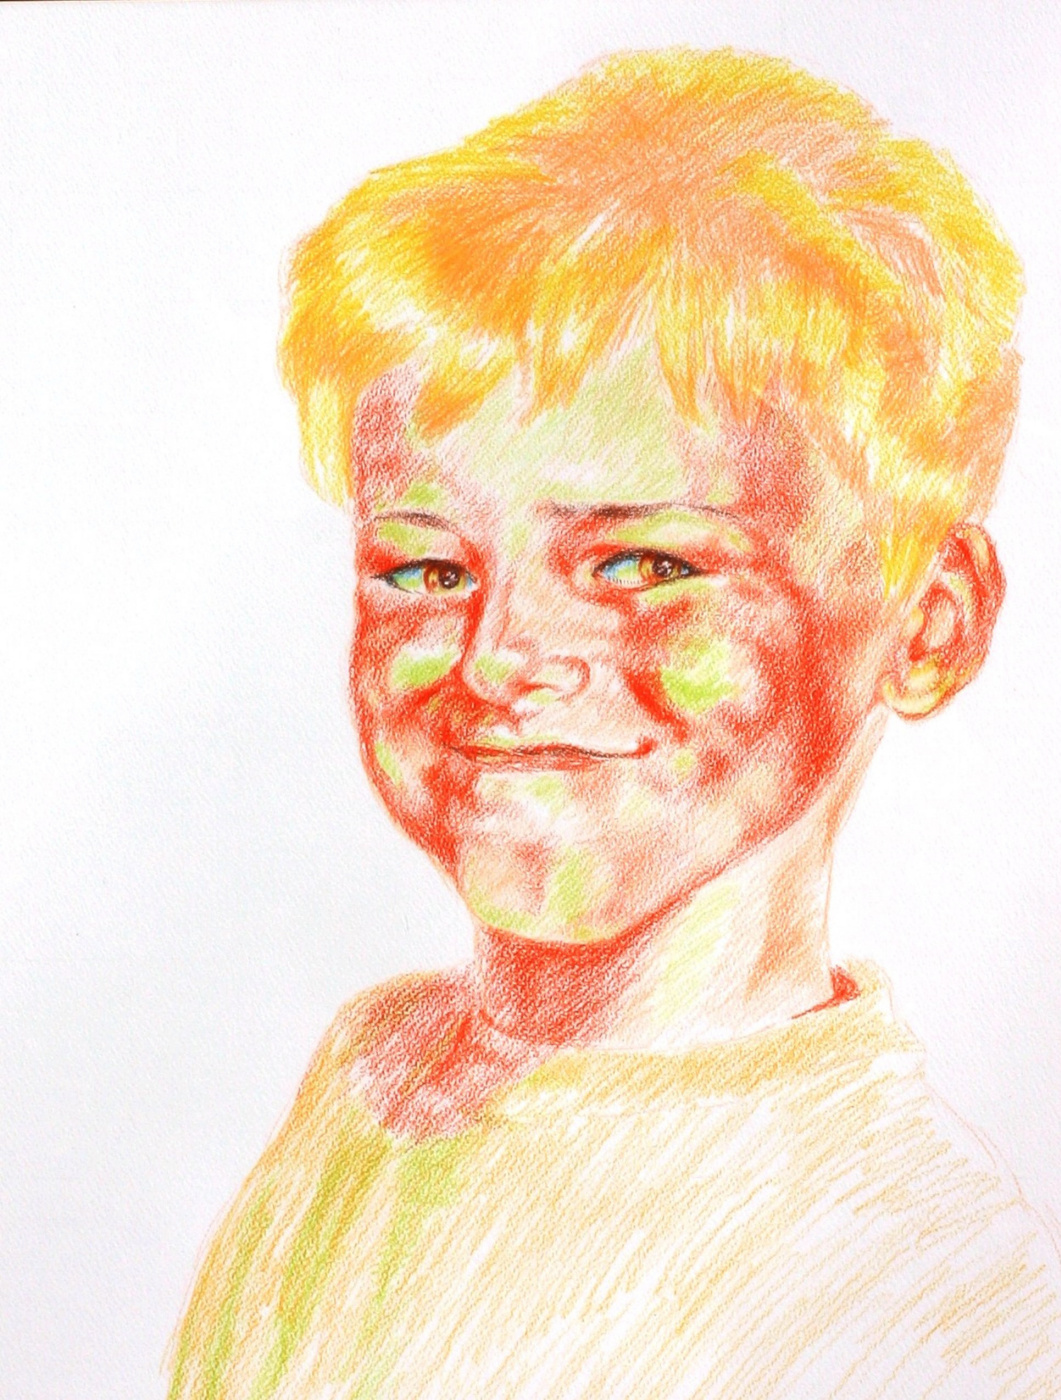 Alexander Ocher Kandinsky-DAE. Sunny Boy. (Son of the artist Sasha)